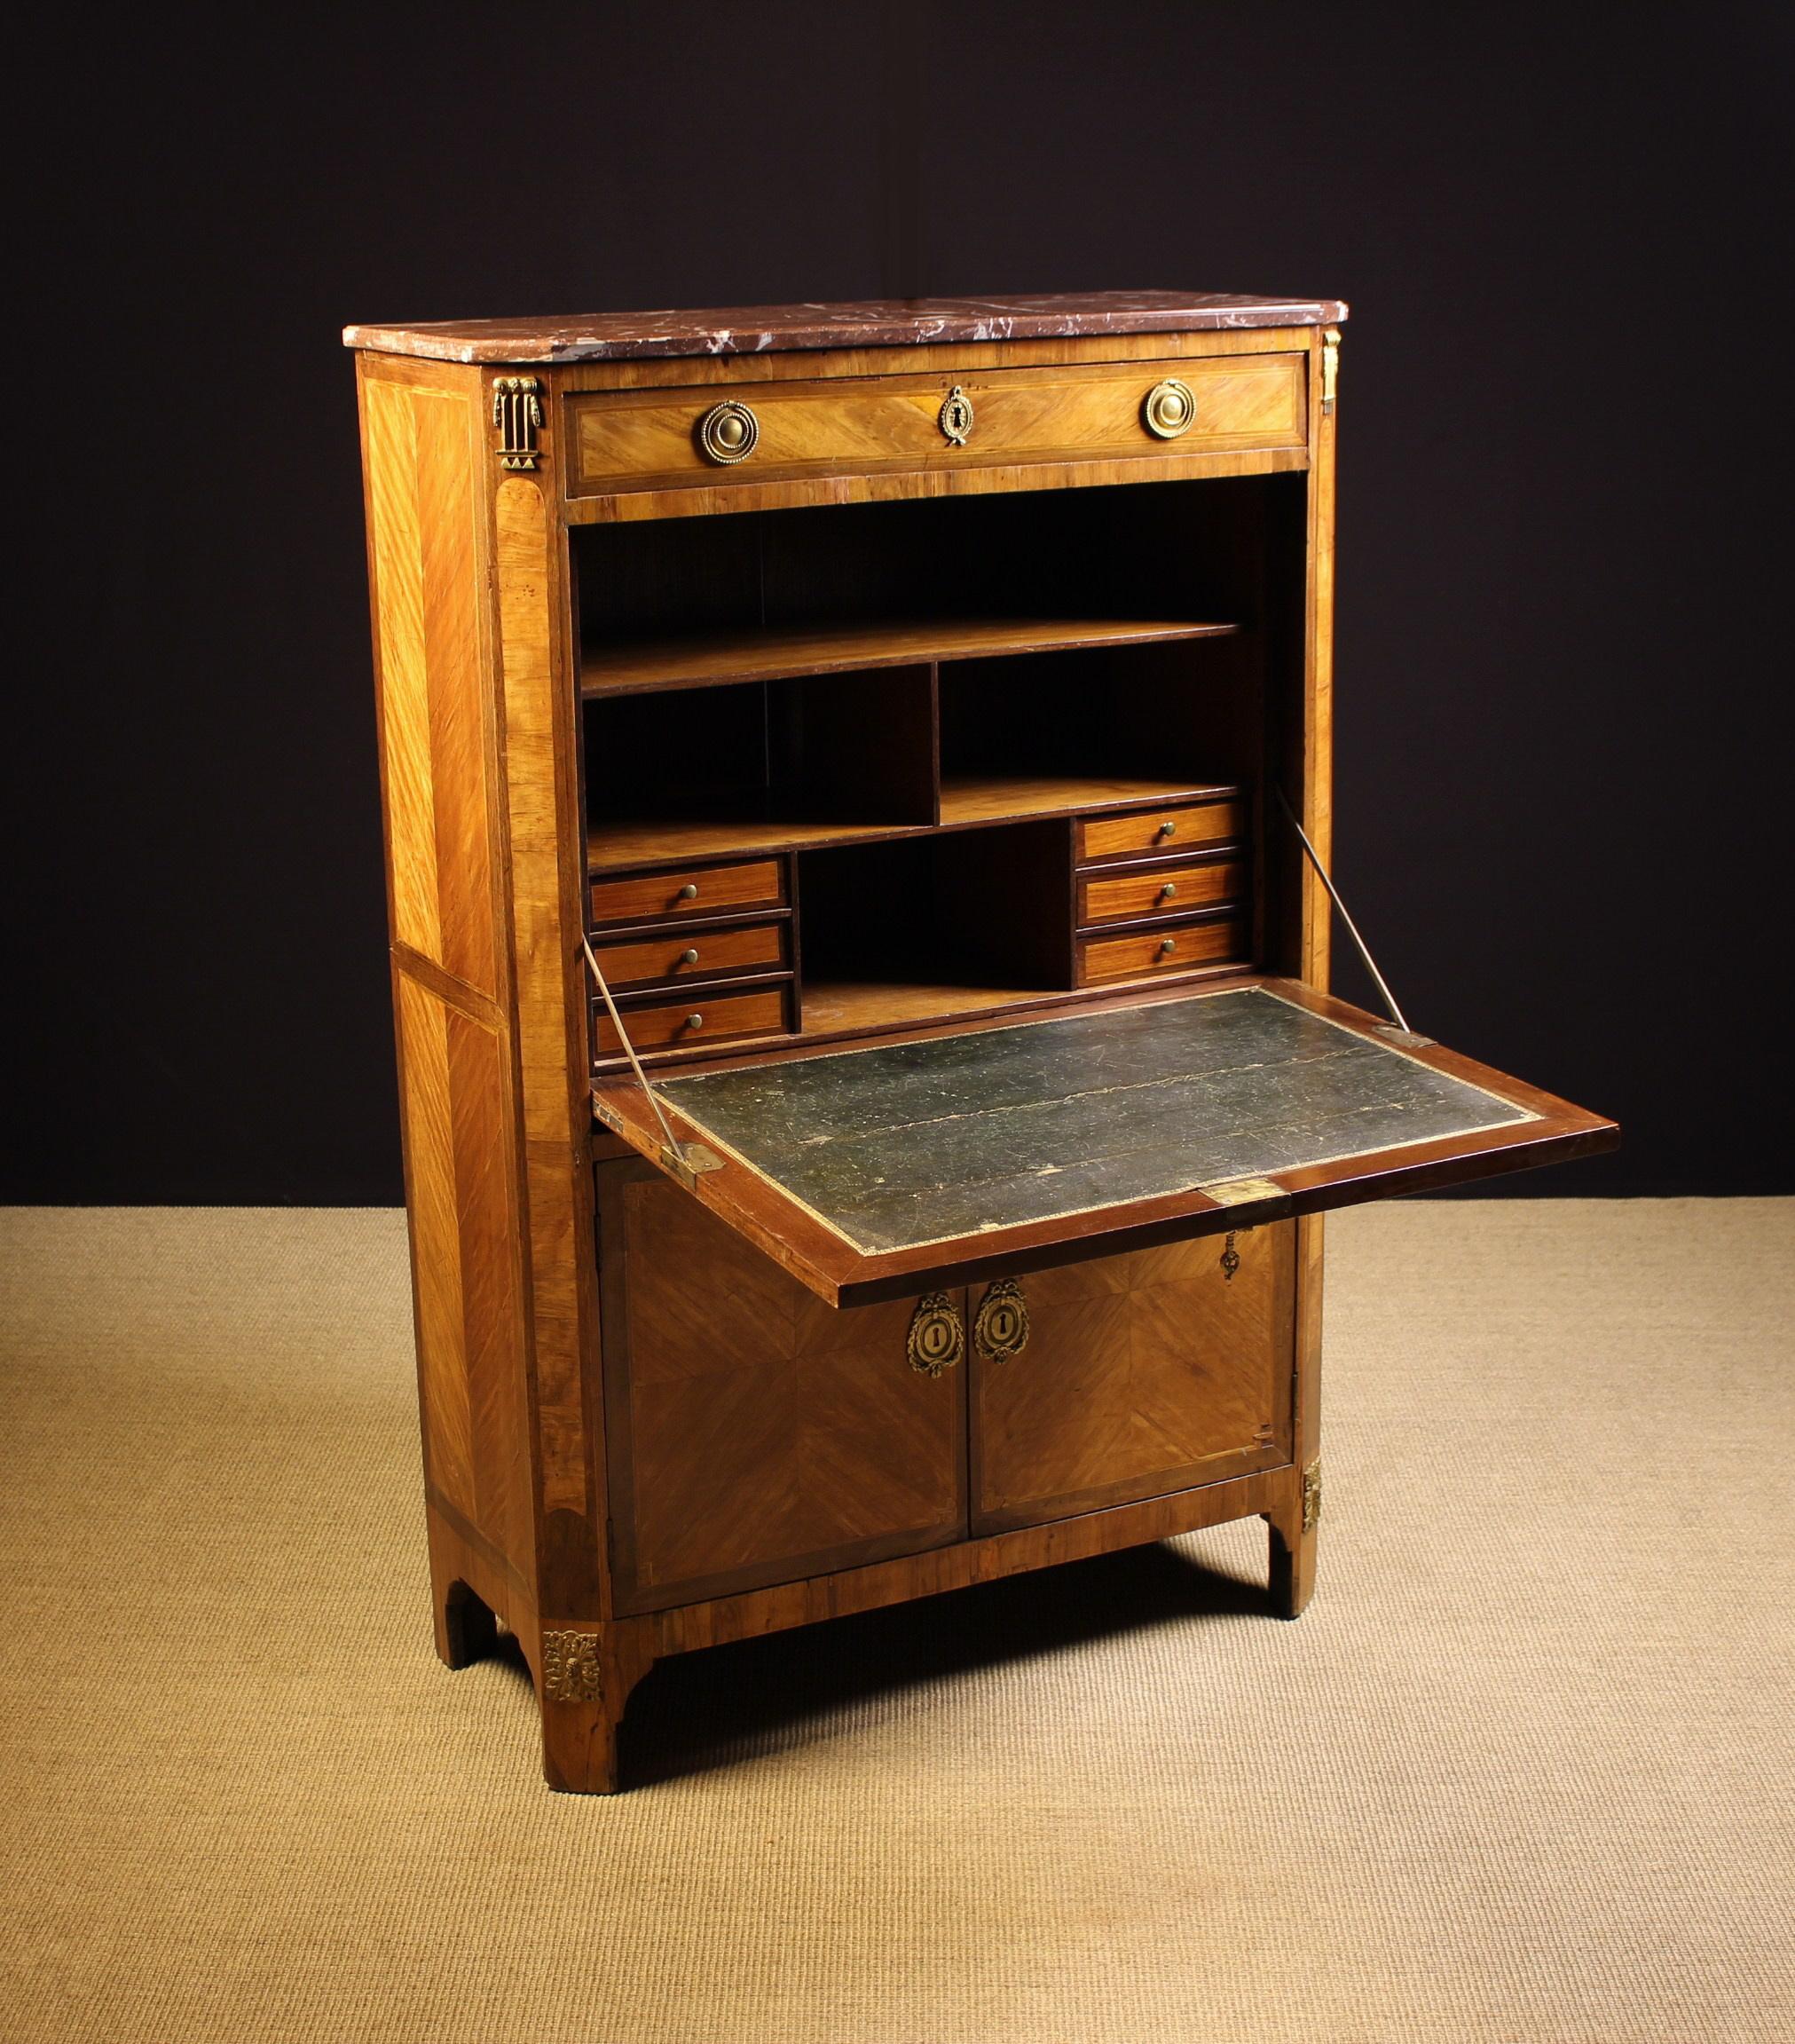 A 19th Century Continental Tulipwood Veneered Escritoire. - Image 2 of 4